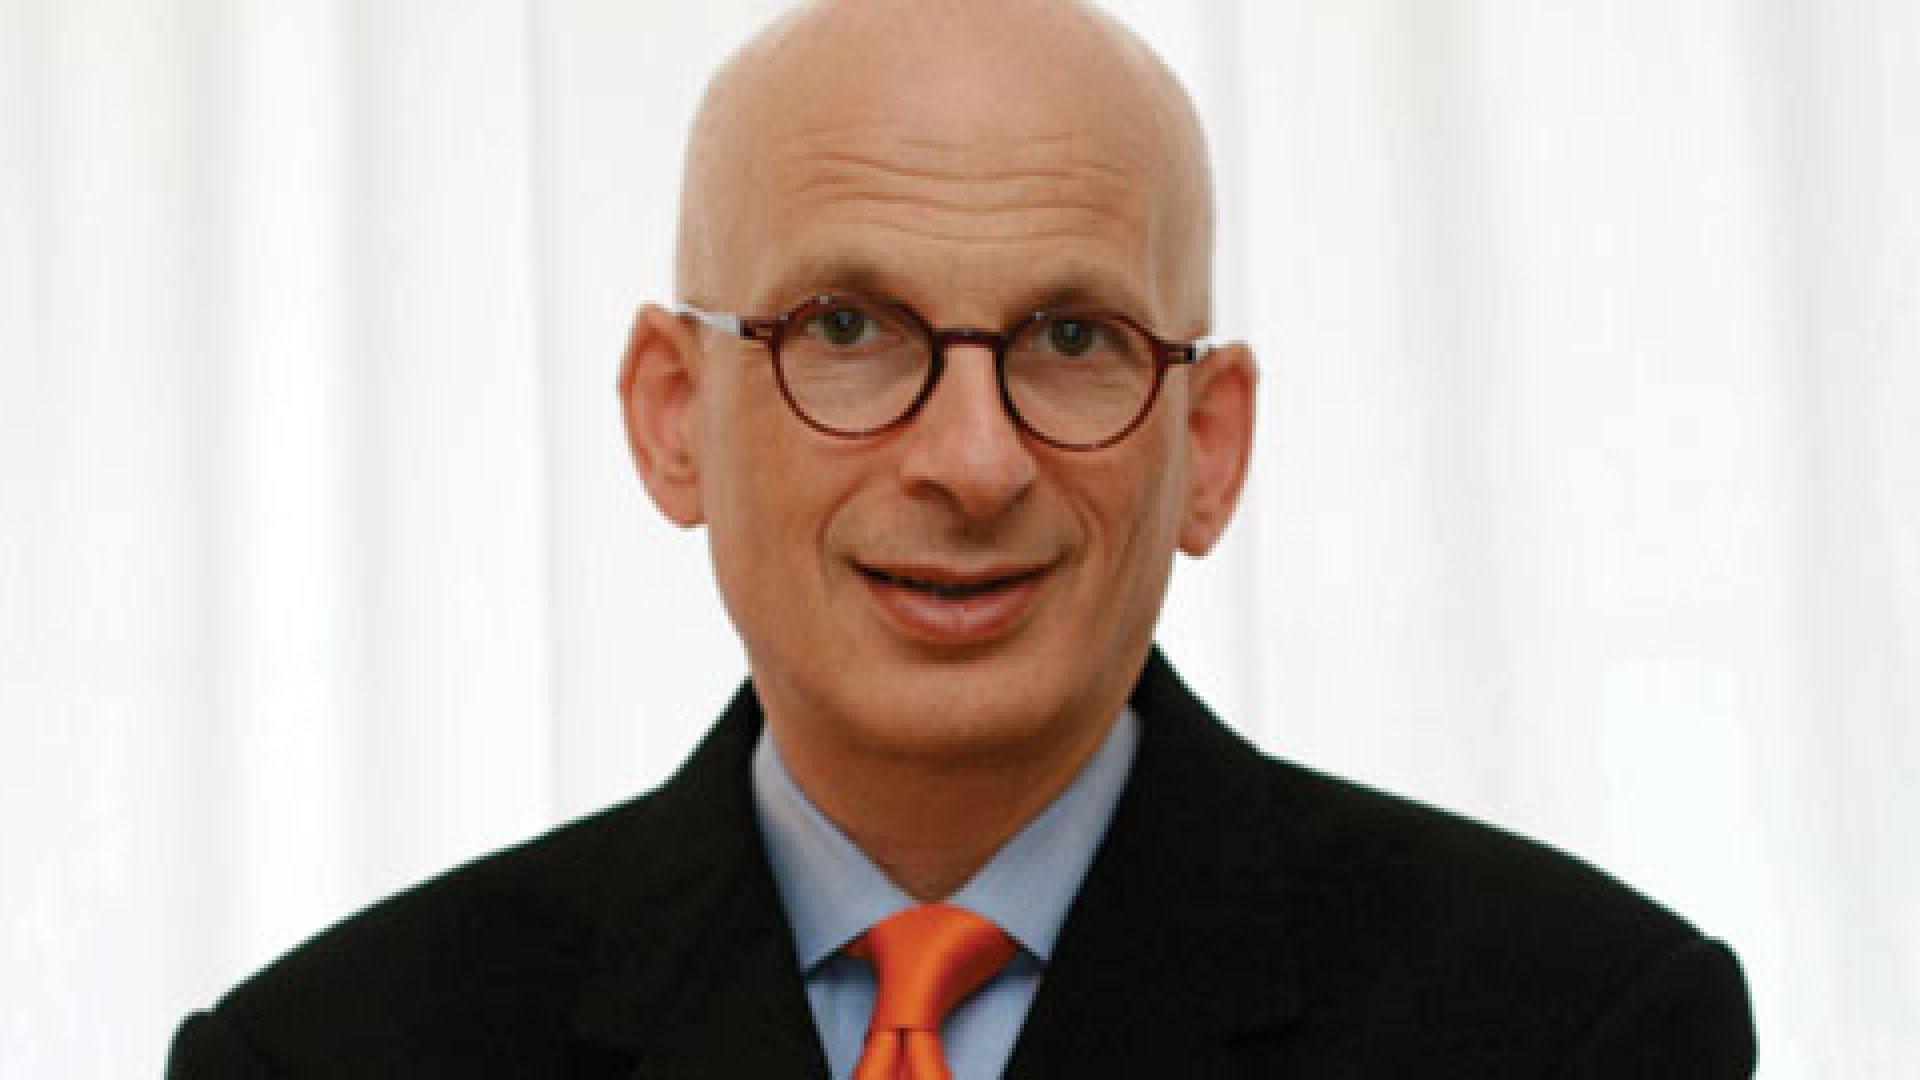 Seth Godin; American entrepreneur, author and public speaker.